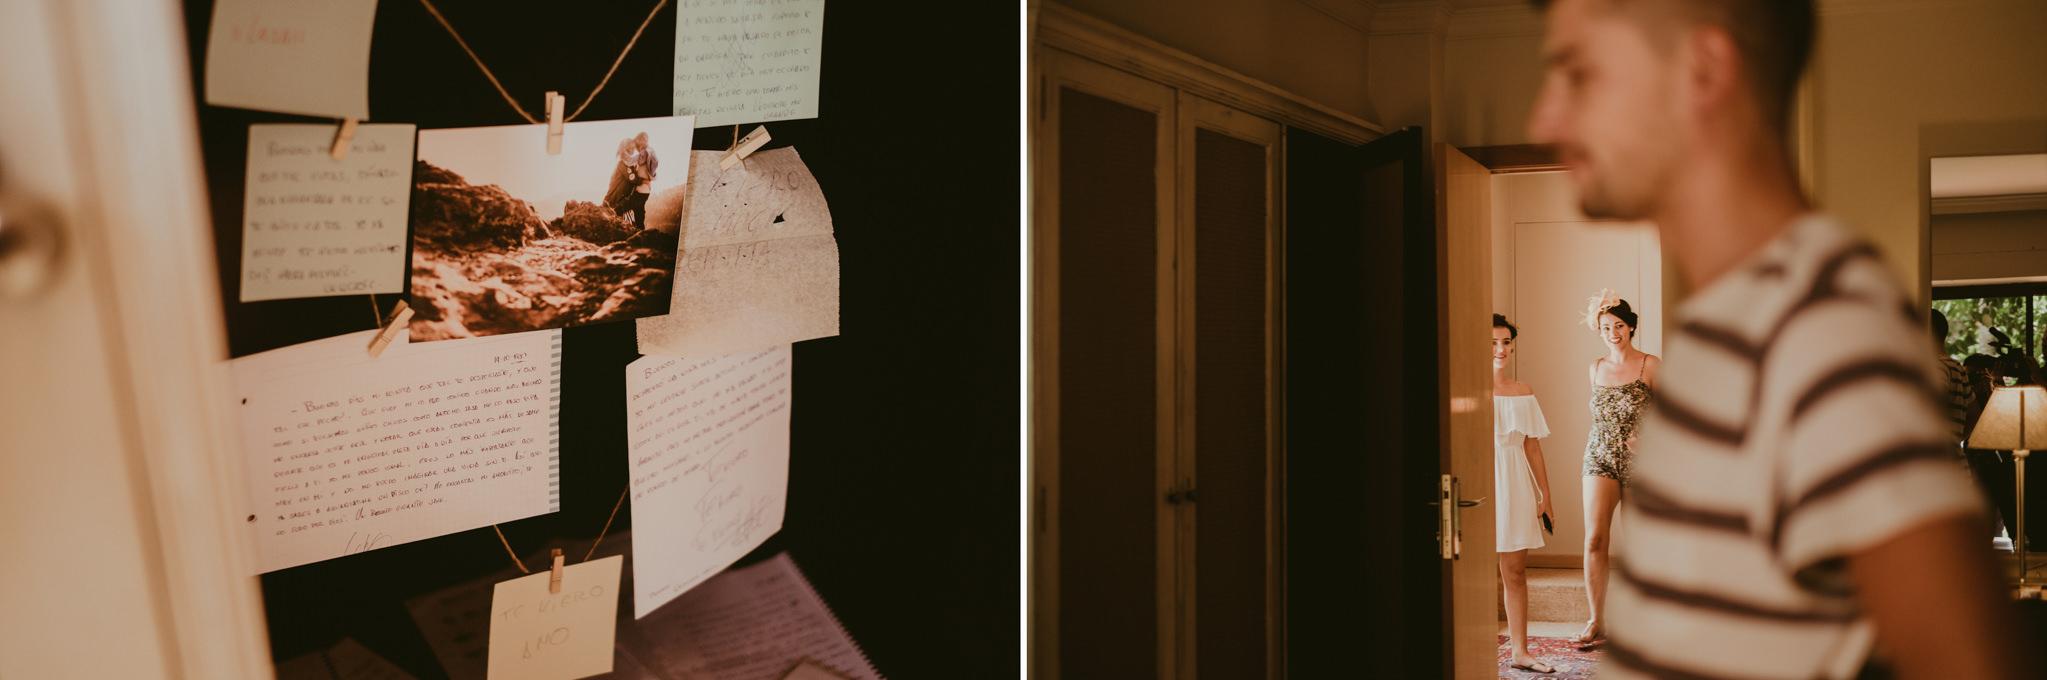 boda-diferente-fotografo-boda-laspalmas-grancanaria-105